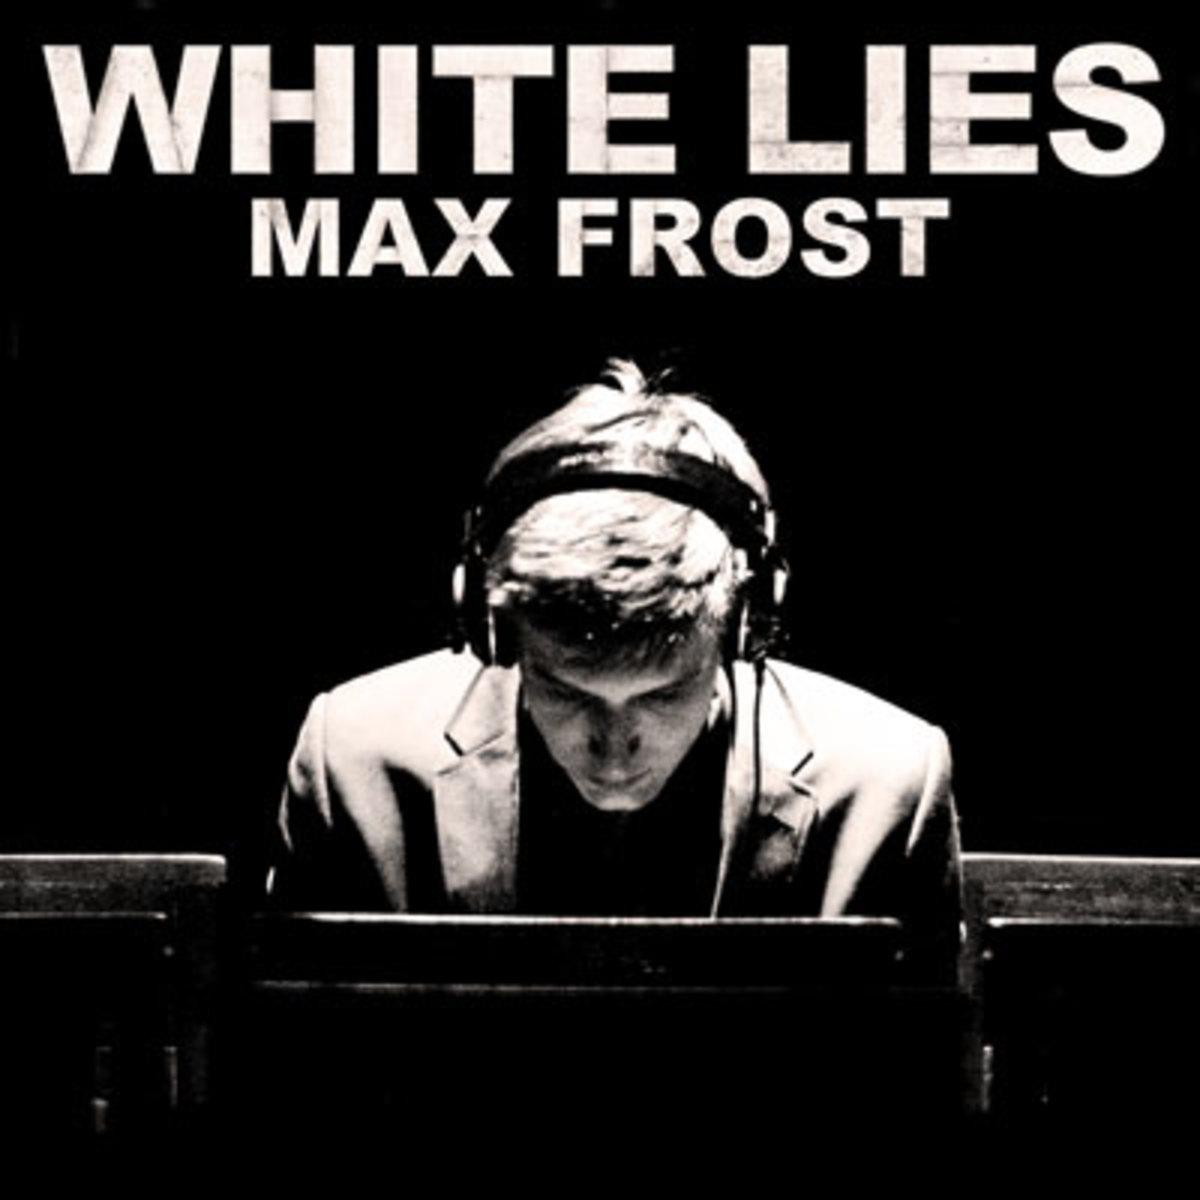 maxfrost-whitelies.jpg